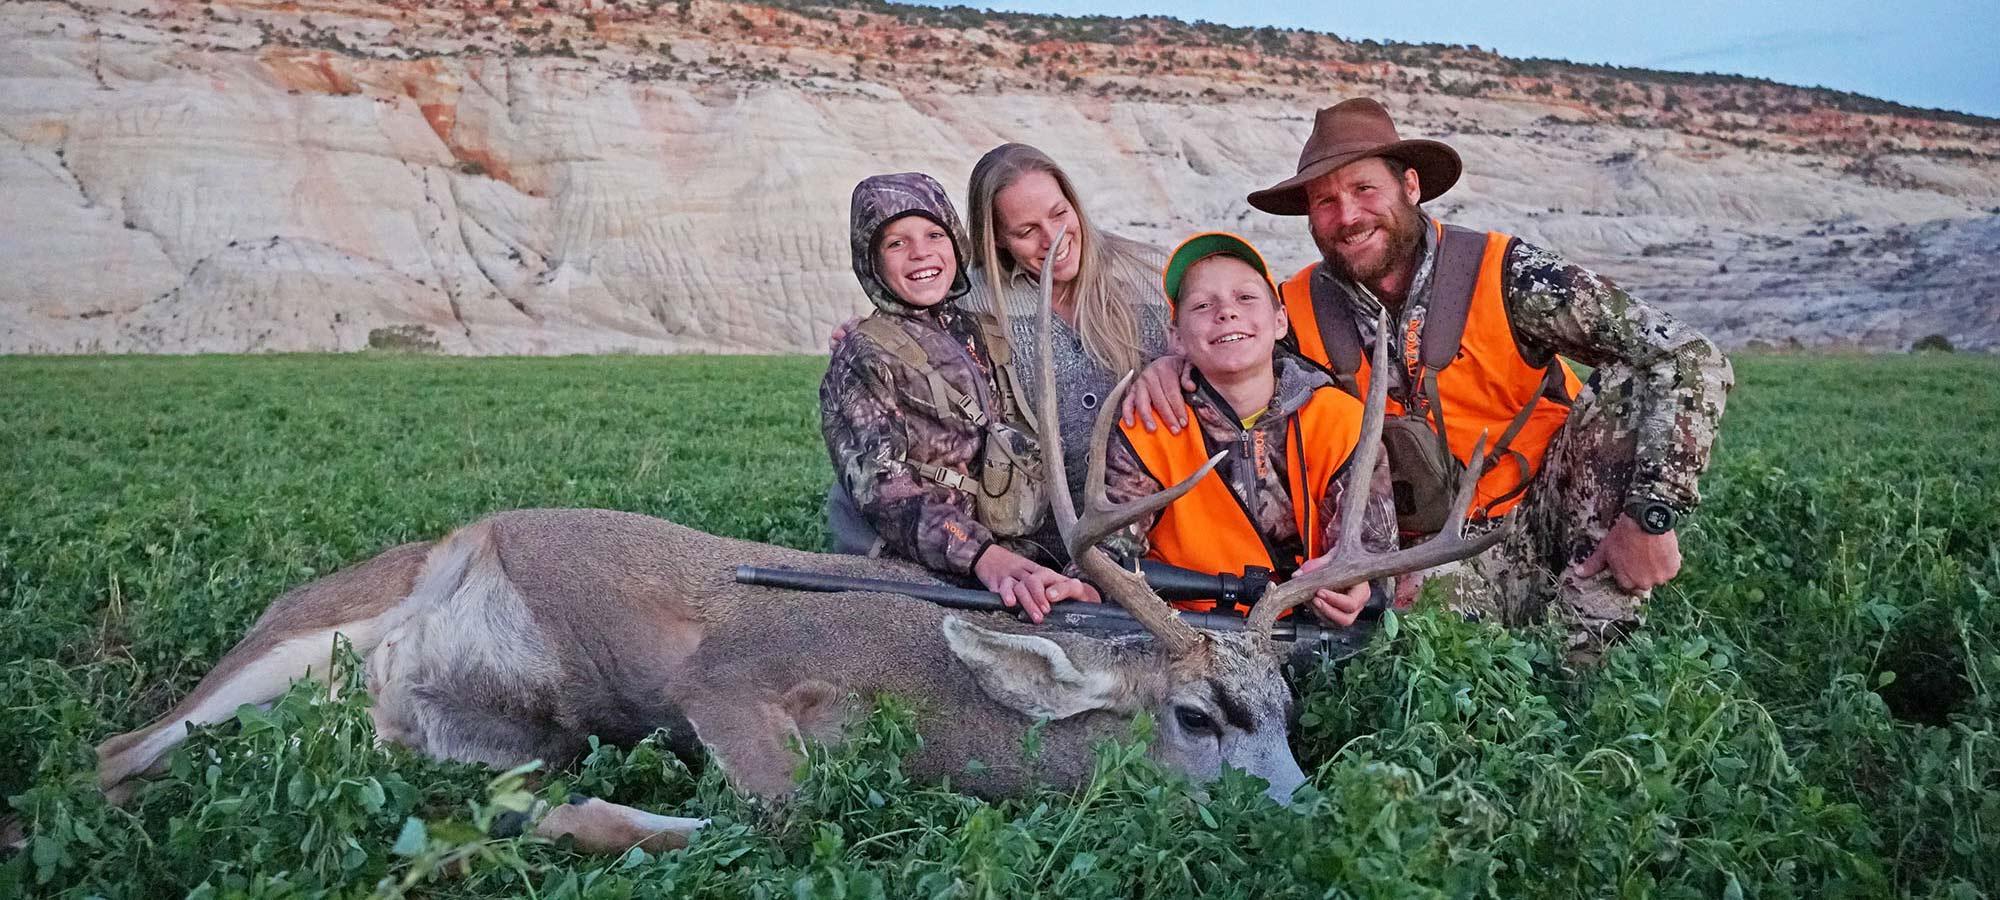 The Family Deer Hunt, Sponsored by onX Hunt